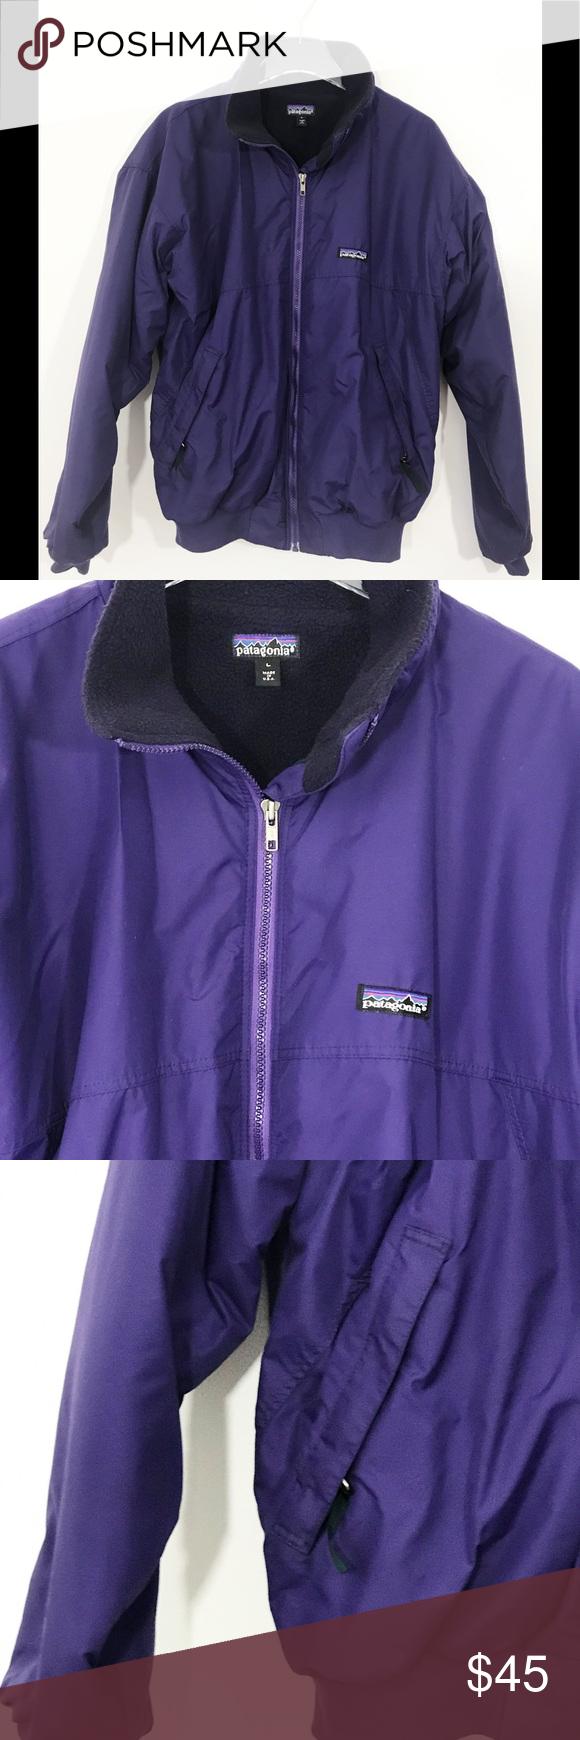 Vintage Patagonia Men S Bomber Fleece Lined Jacket Line Jackets Preppy Wardrobe Essentials Jackets [ 1740 x 580 Pixel ]